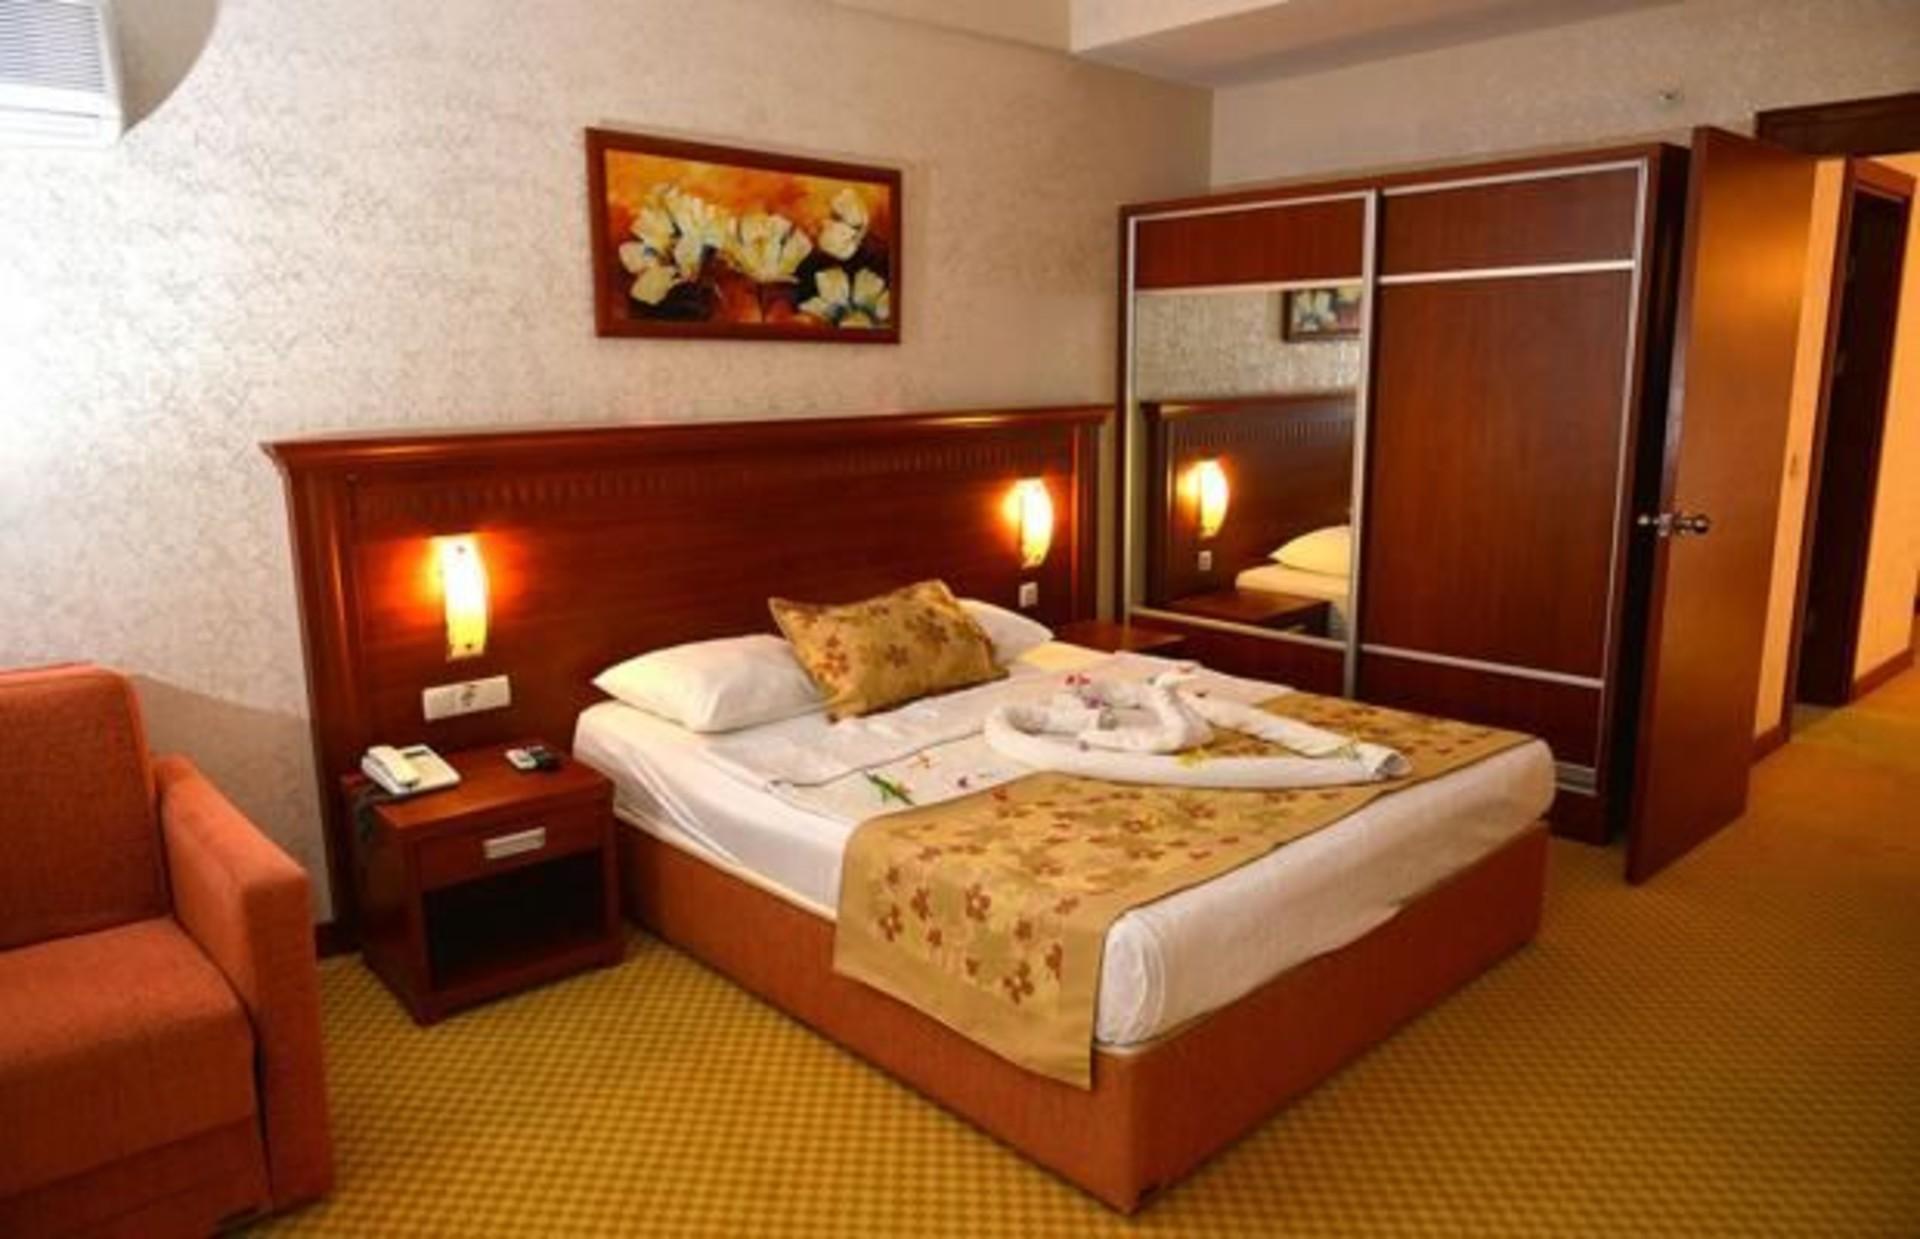 laphetos-hotel-1815006.jpg